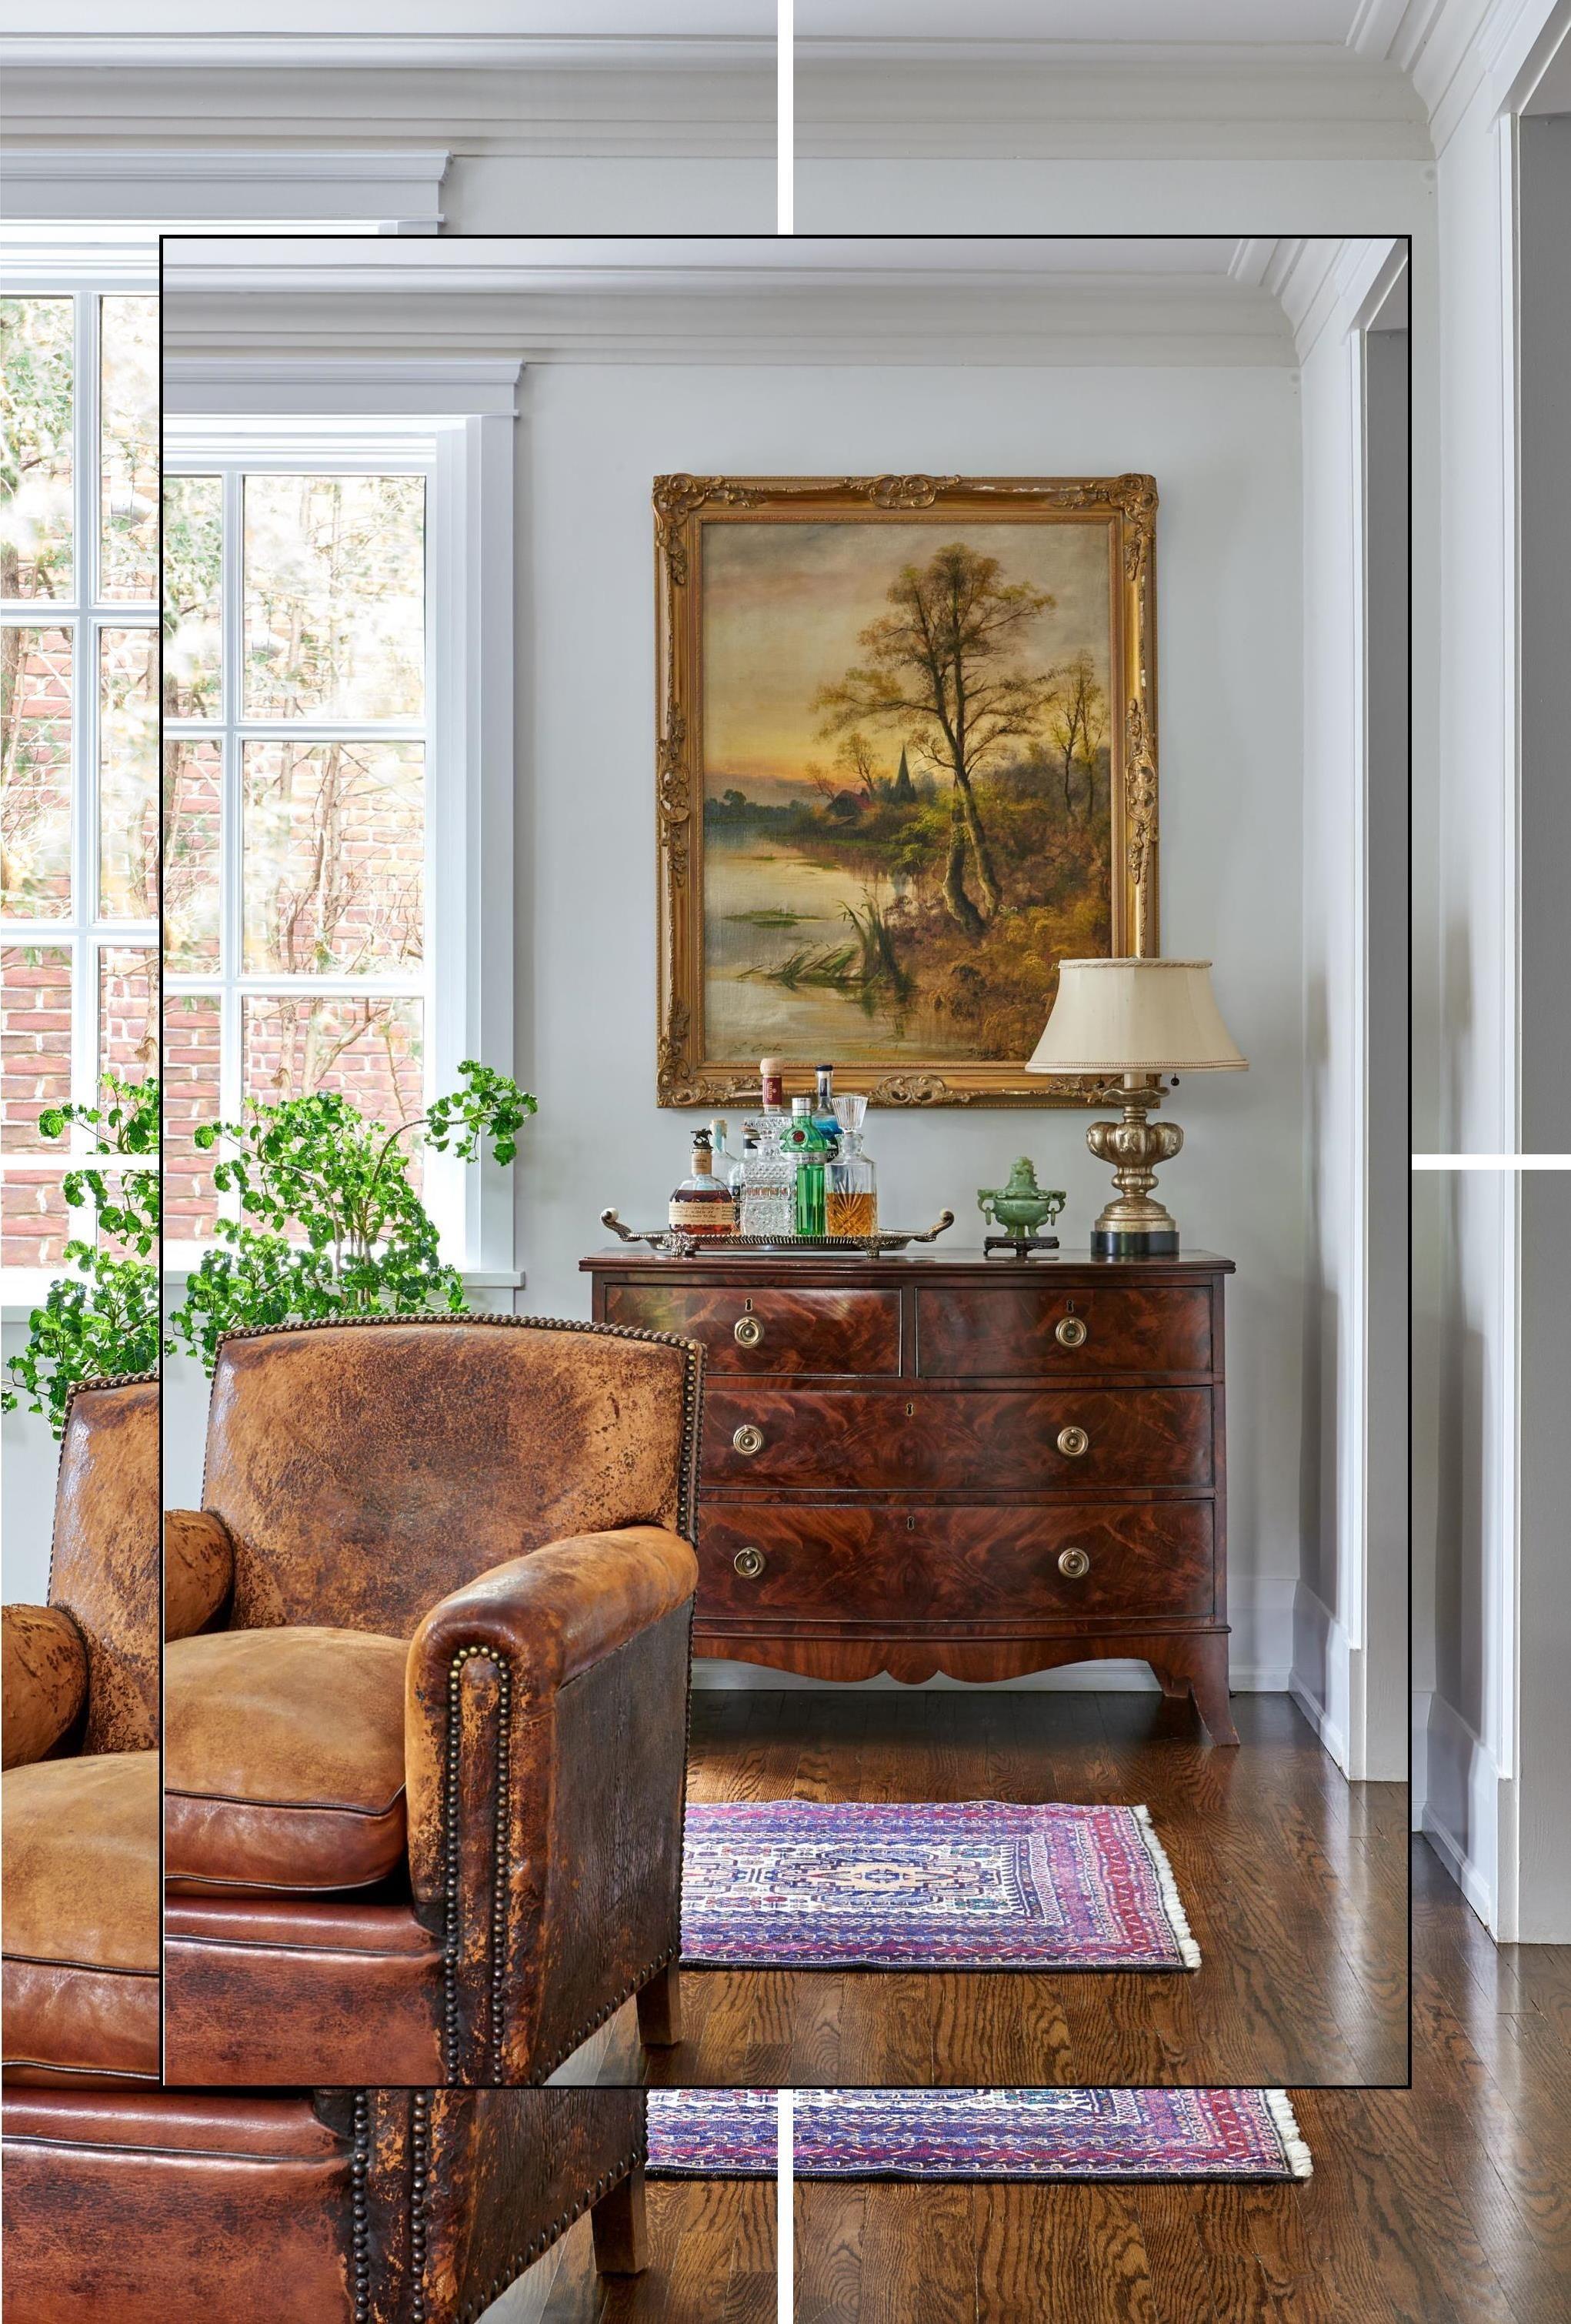 Loft Furniture Places That Buy Antique Furniture Near Me